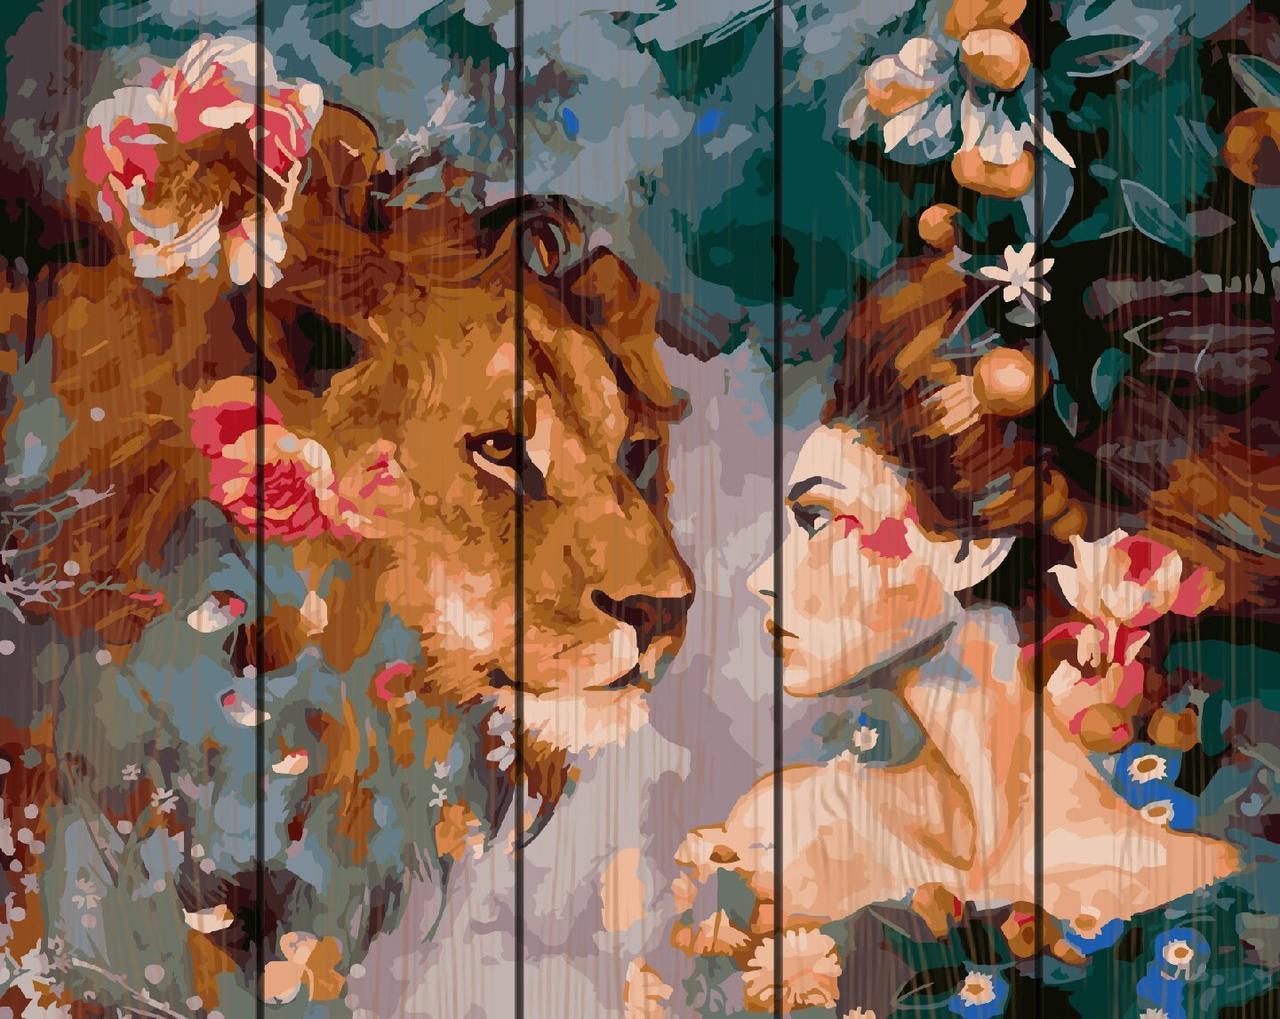 RA-GXT23397 Раскраска по номерам на деревяной основе Девушка и лев